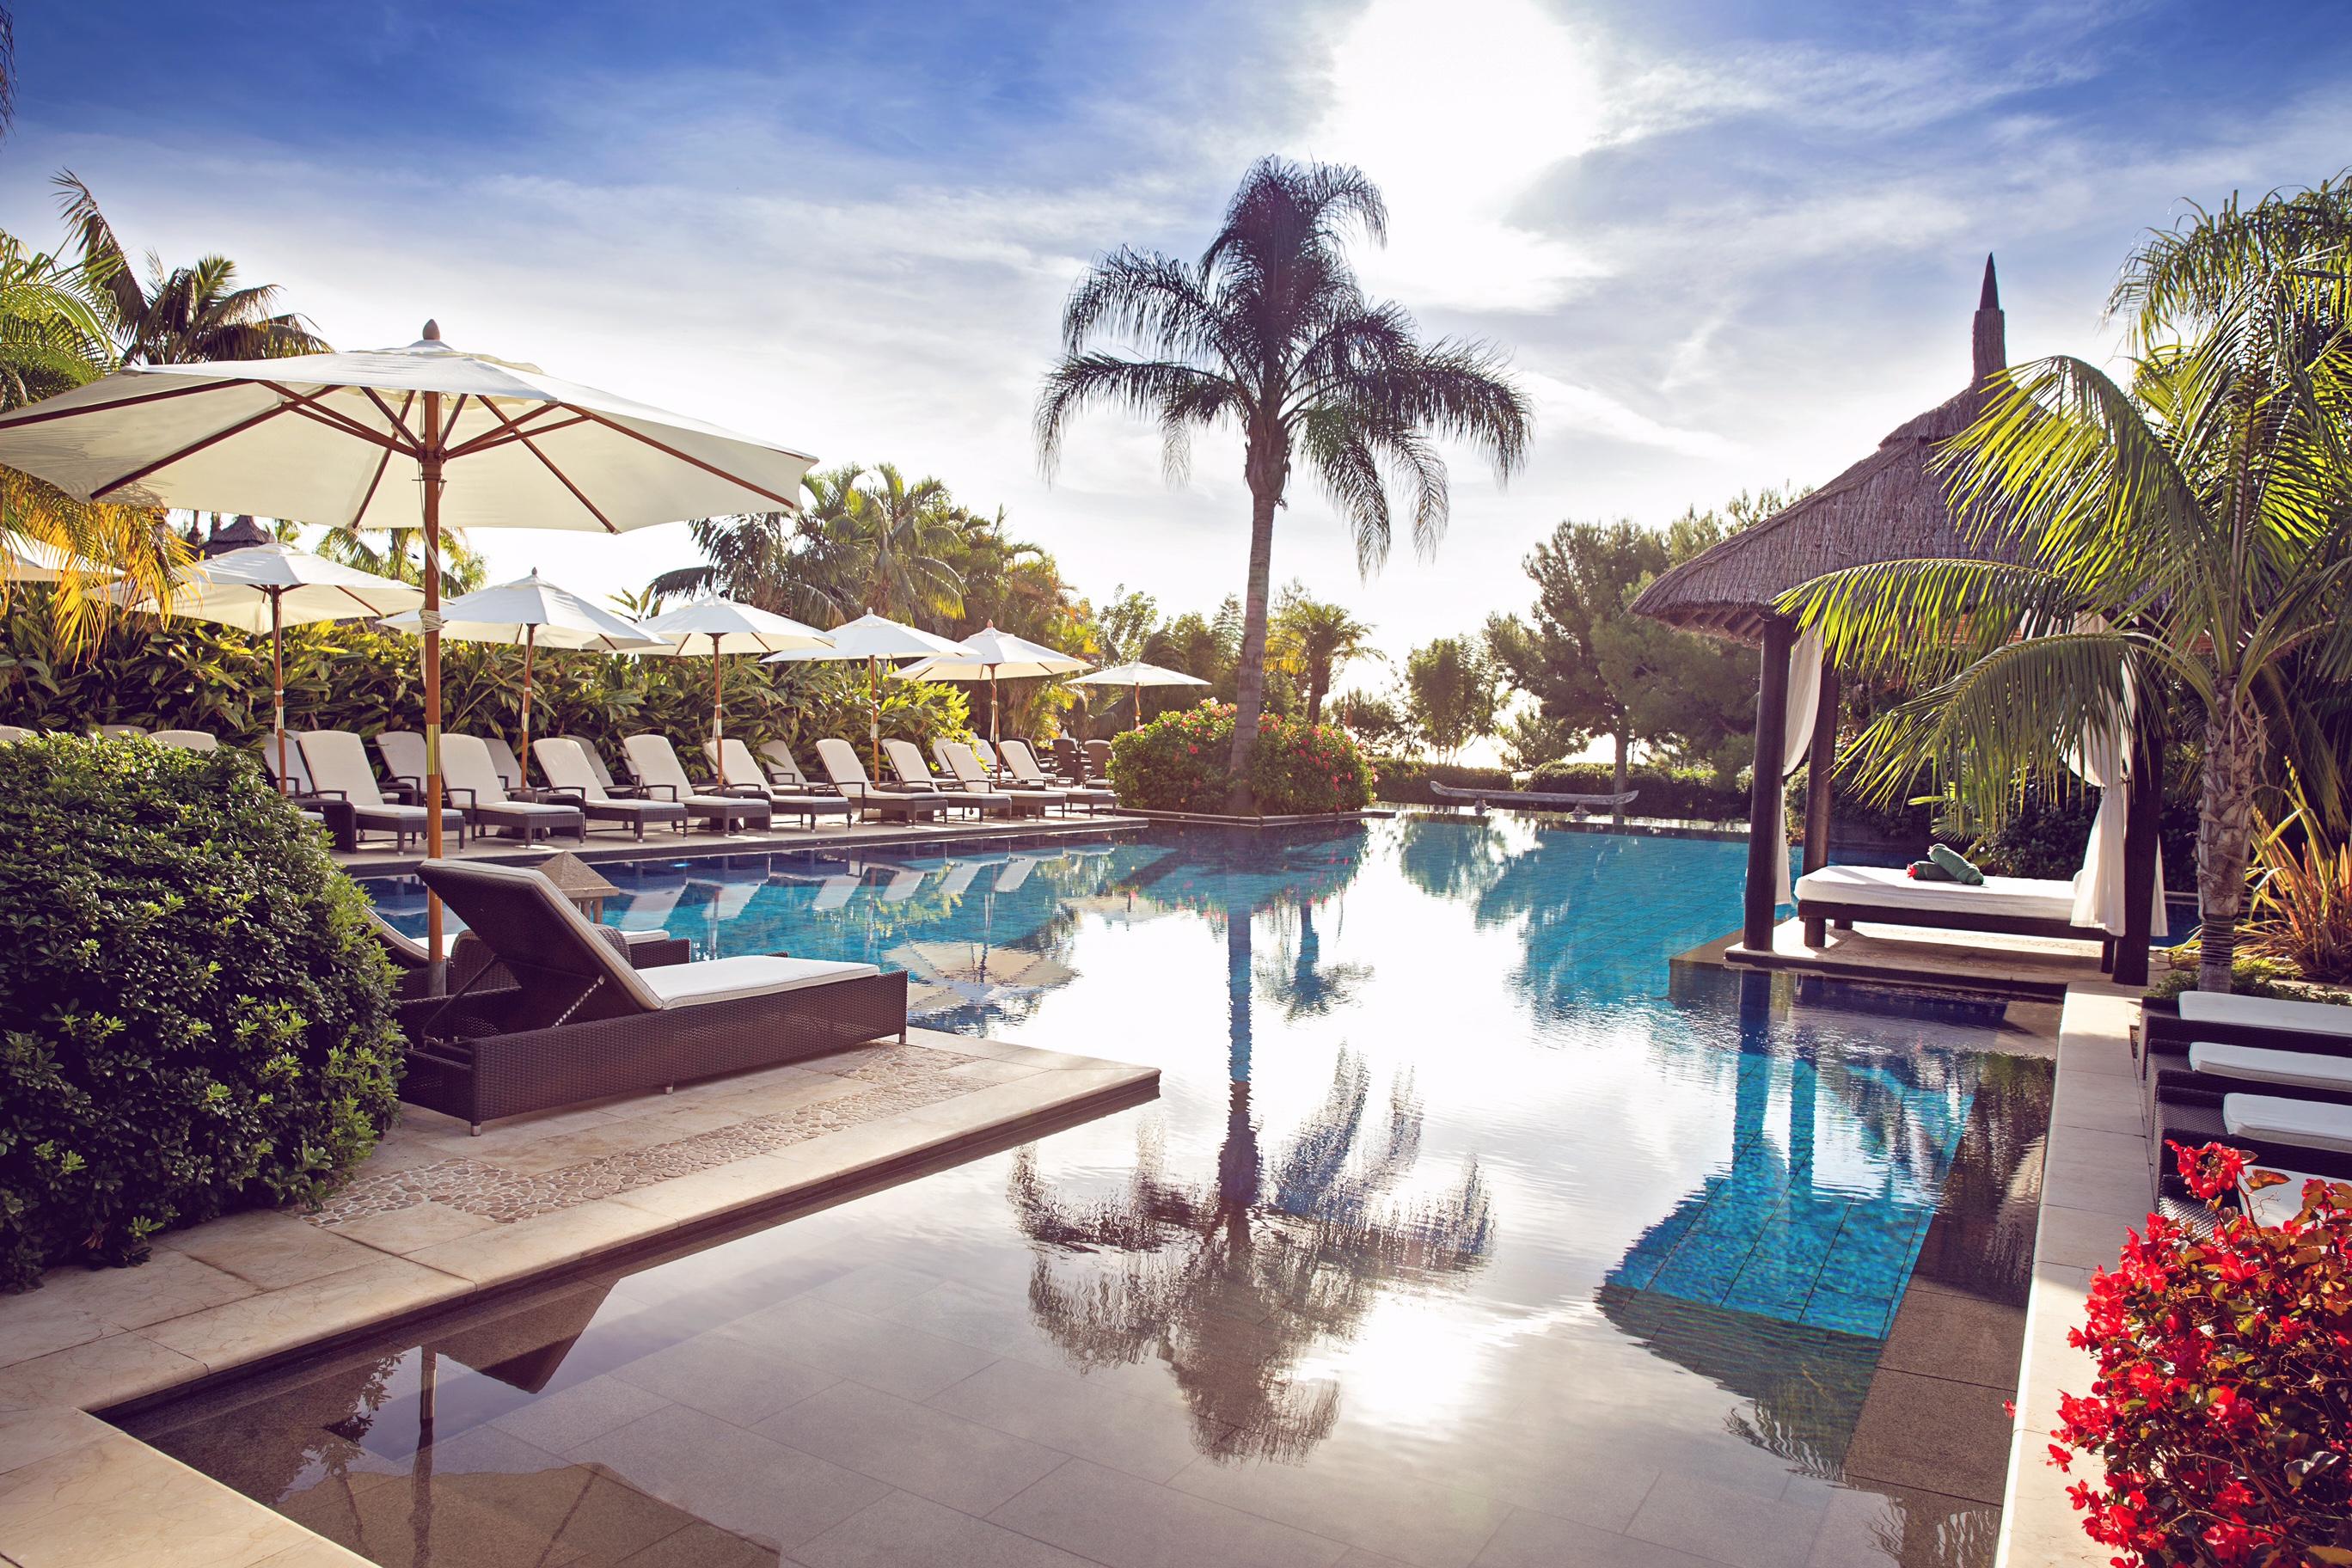 Asia en pleno mediterr neo the pocket magazine - Hotel asiatico benidorm ...